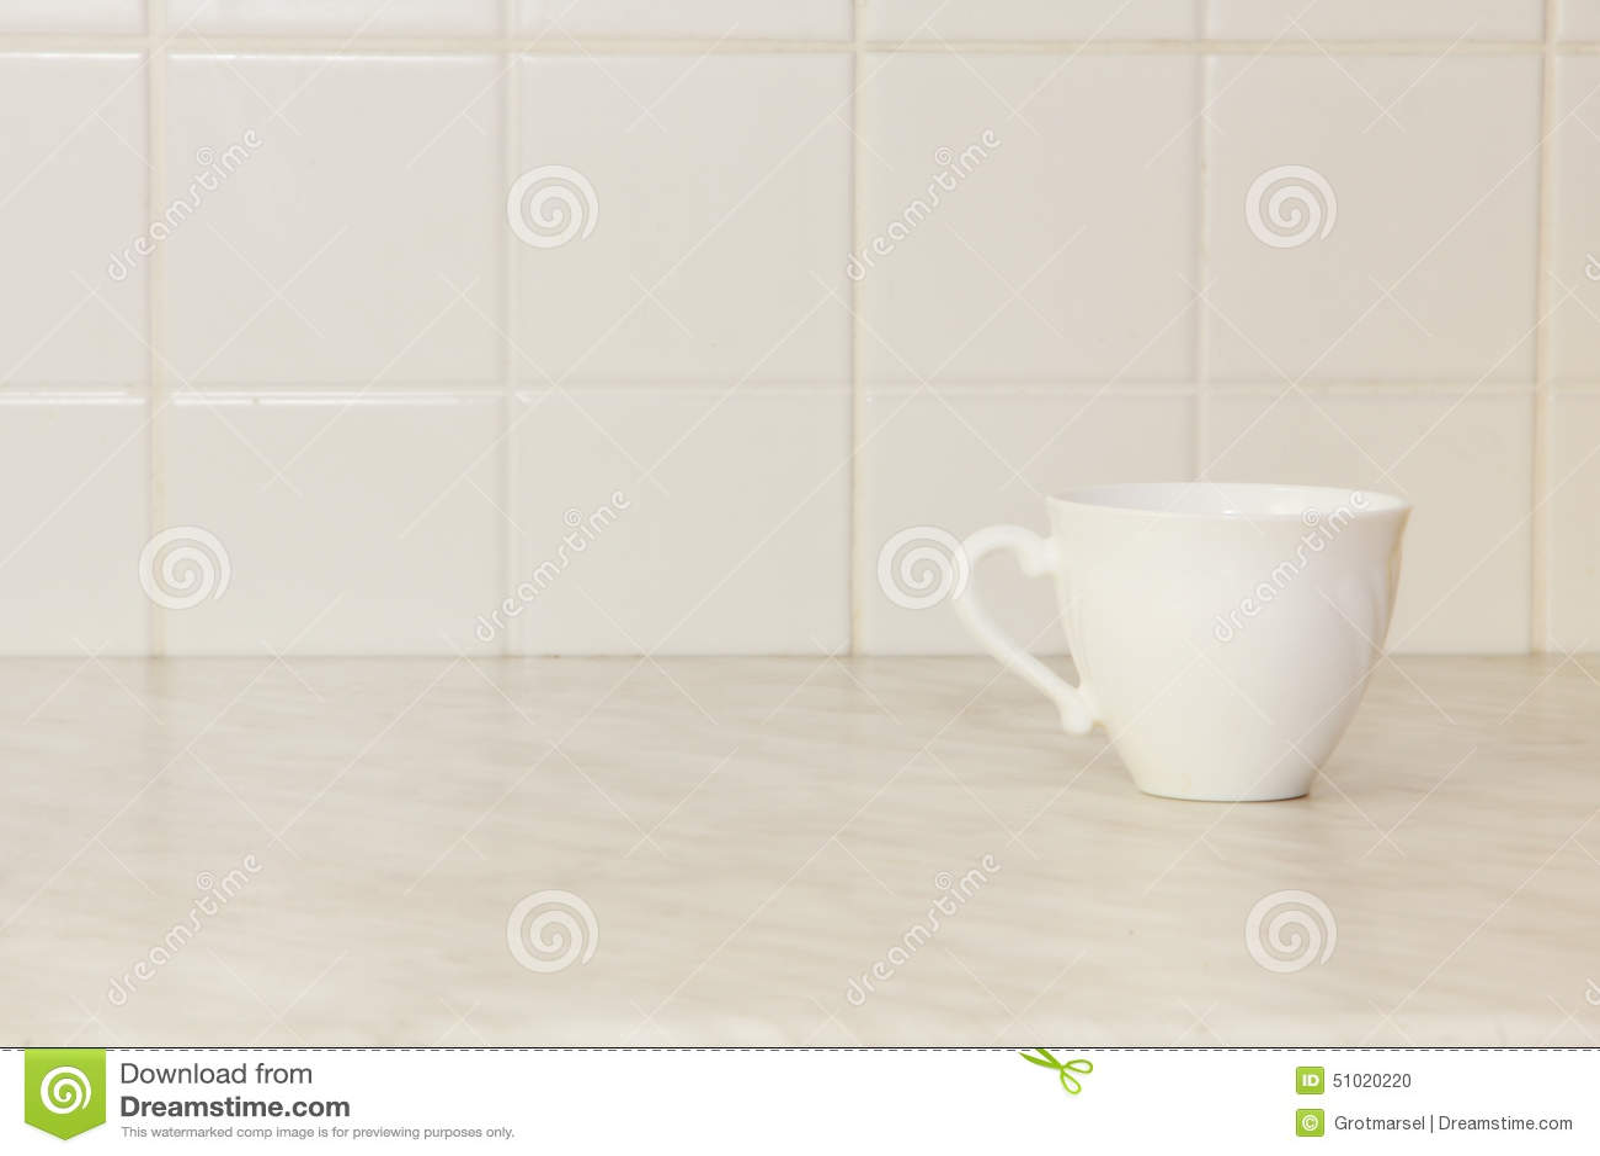 Ceramic Tea Cup On White Kitchen Table Stock Photo